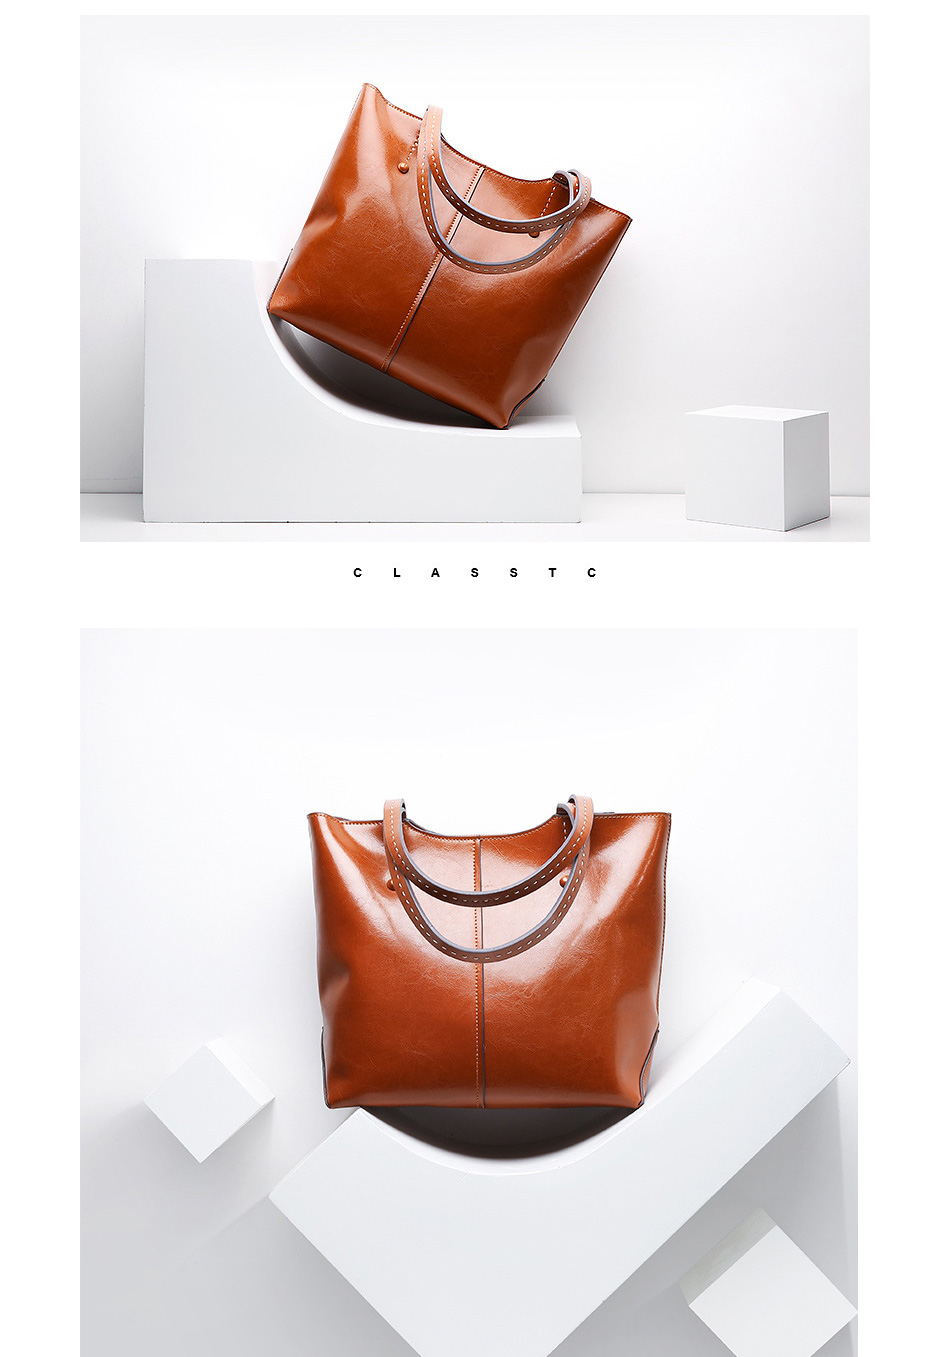 Zency 100% couro genuíno moda feminina bolsa